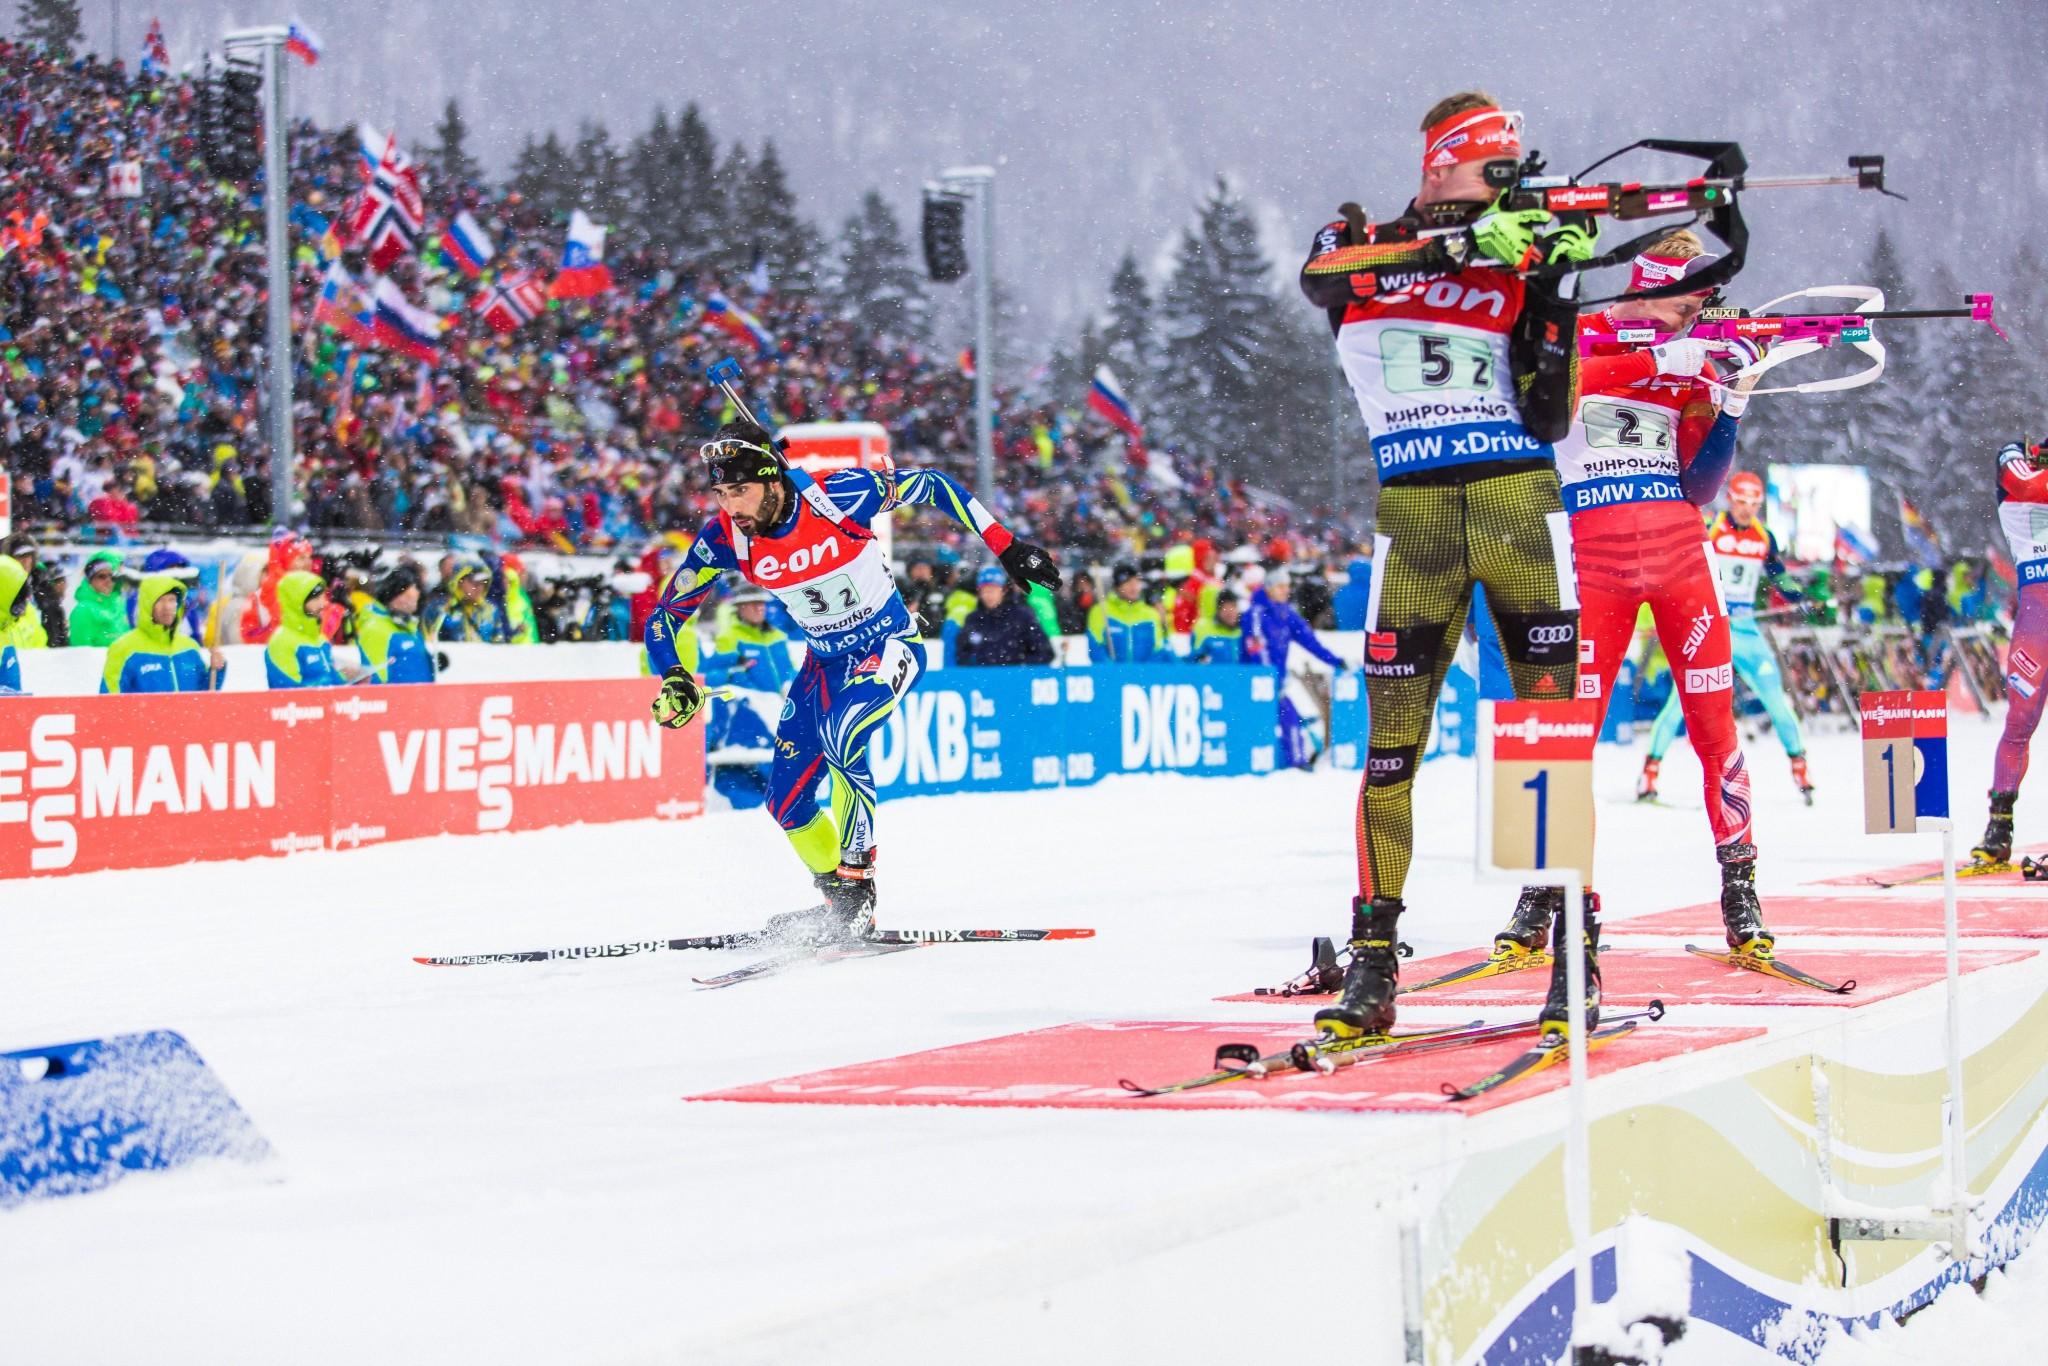 Biatlon 2017-2018